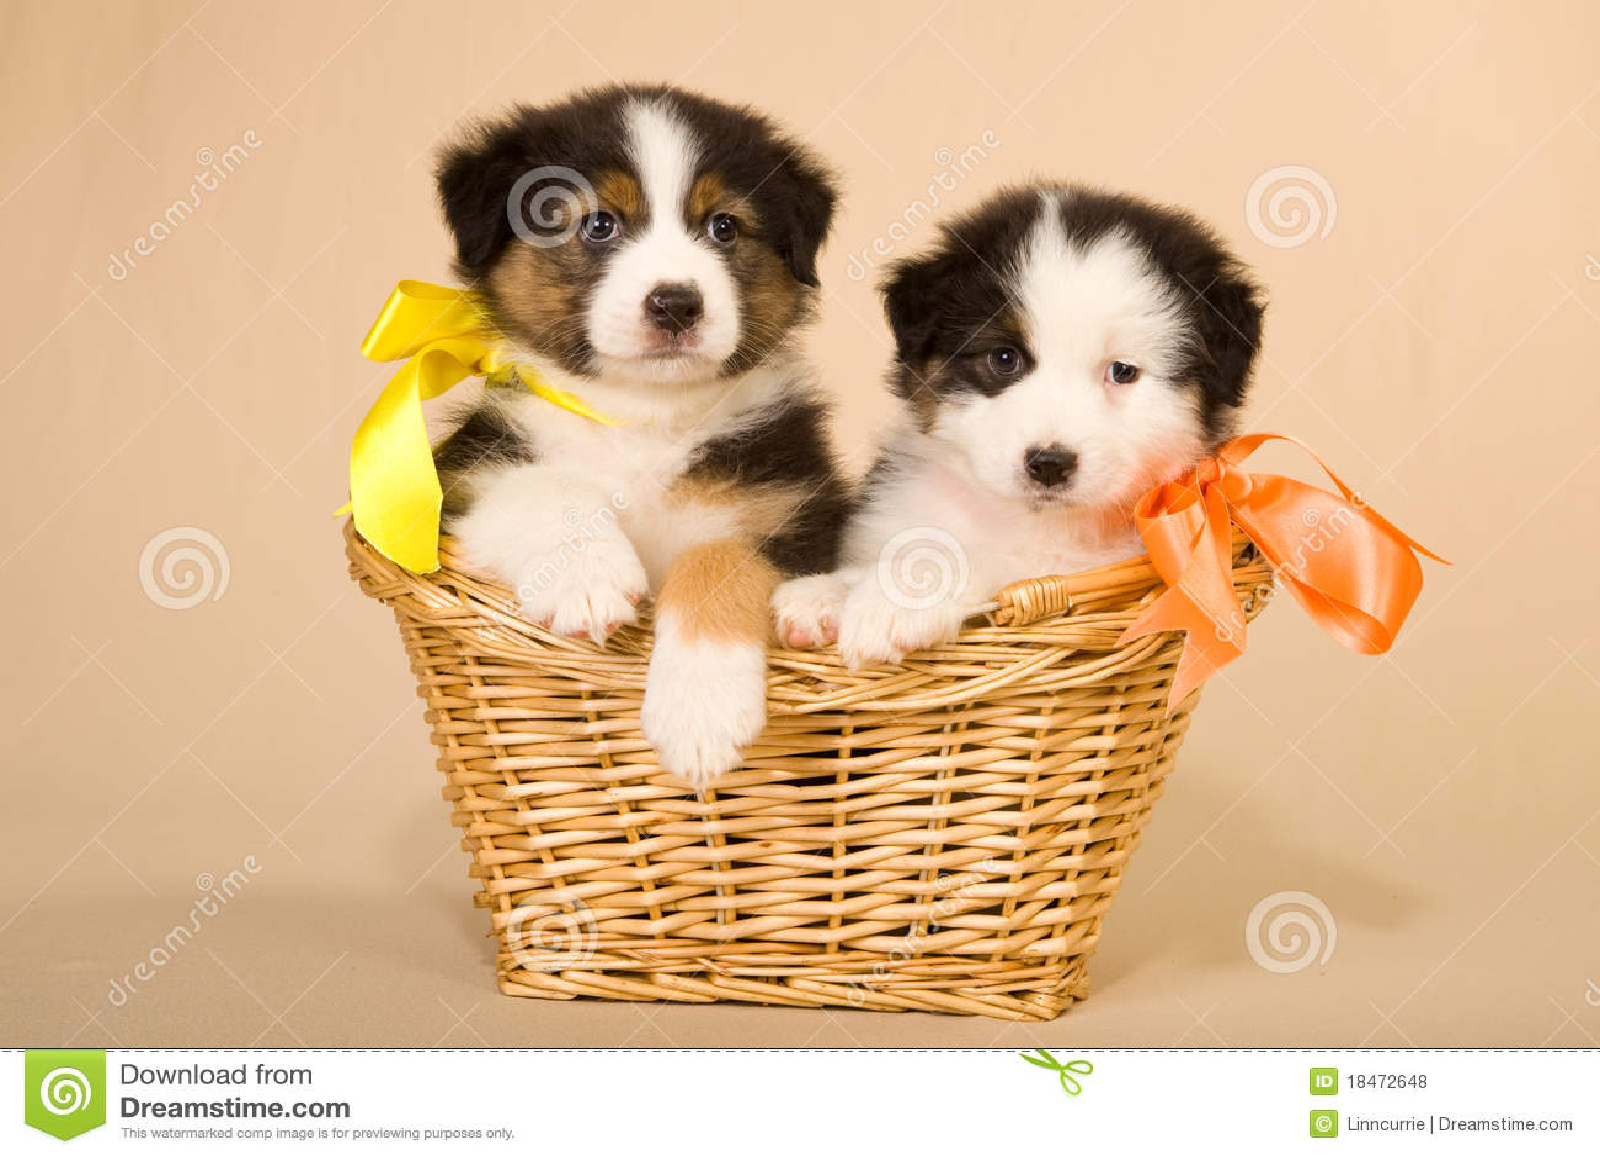 Australian Shepherd Puppies In Basket Royalty Free Stock ...